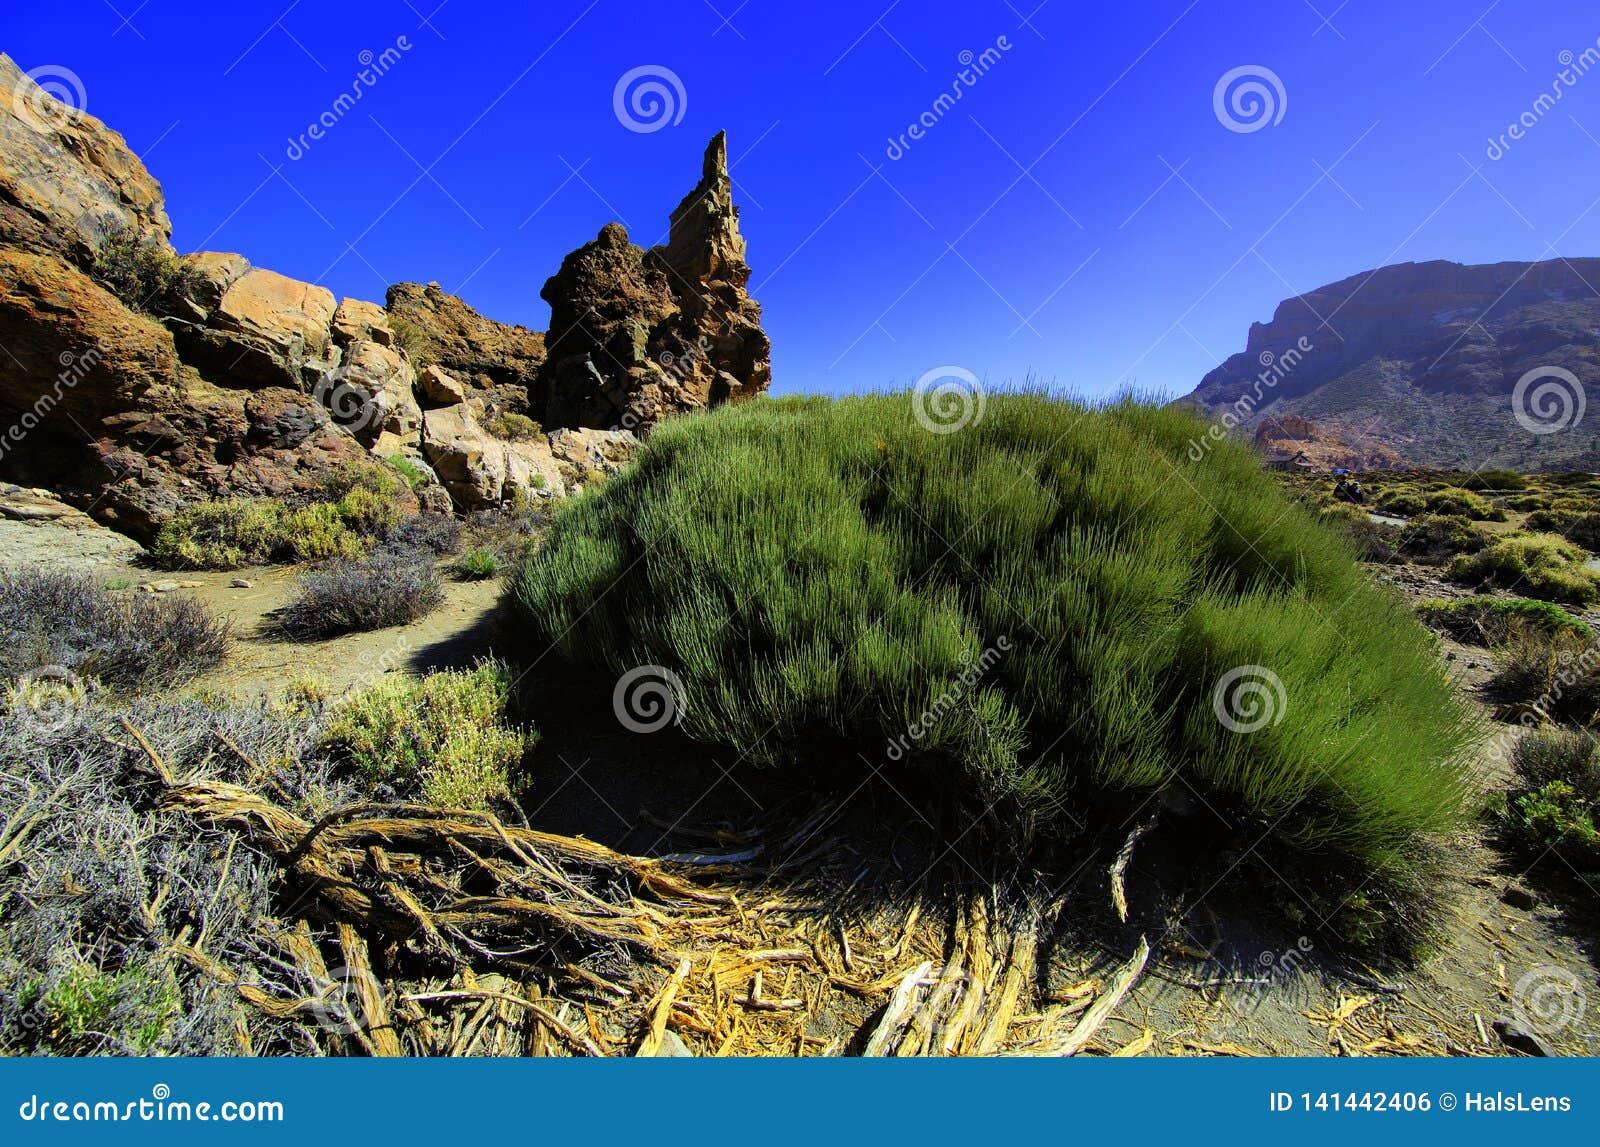 Volcanic Mountains of Tenerife